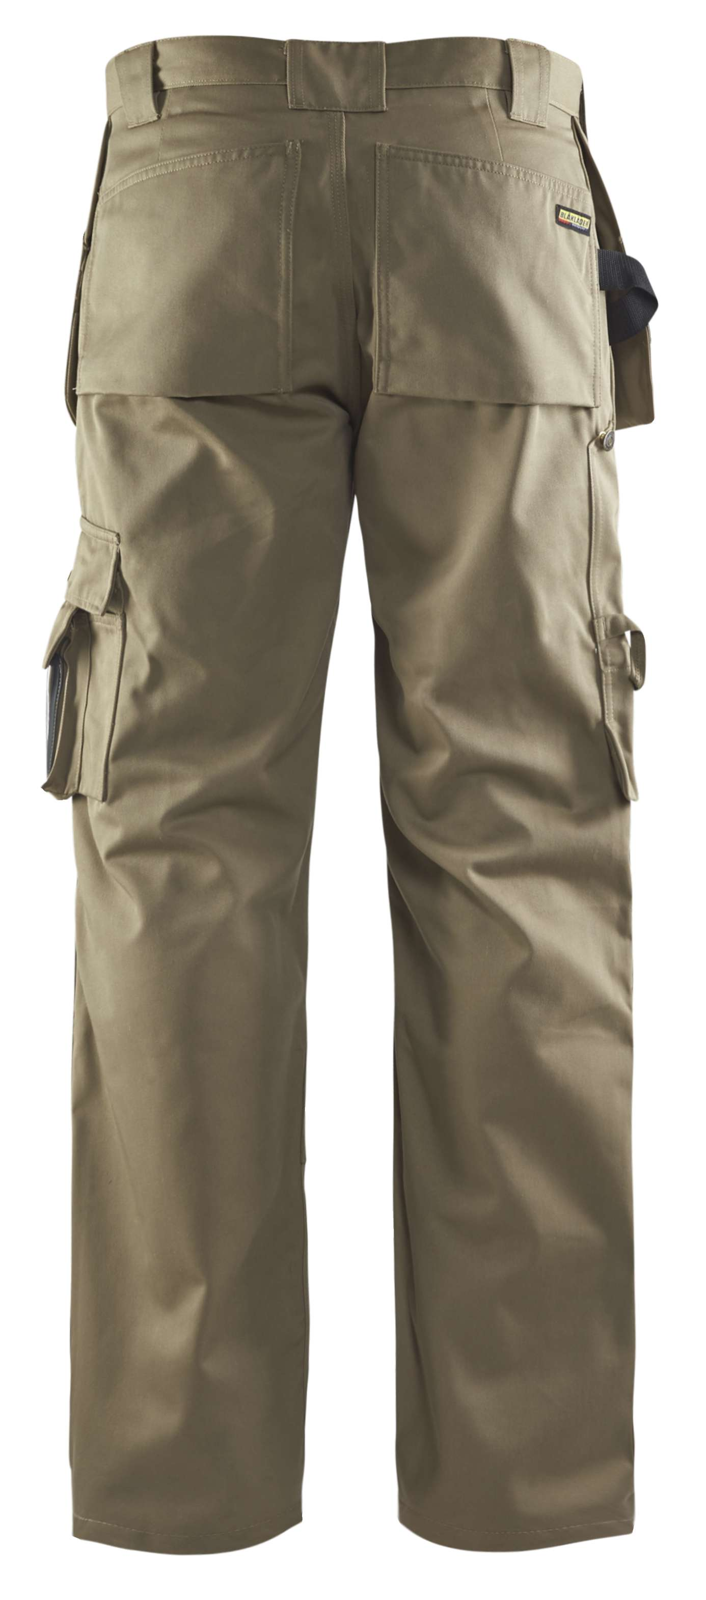 Blaklader Ambacht Werkbroeken- kniezakken- spijkerzakken 15301860 Polyester- katoen- Cordura khaki(2400)